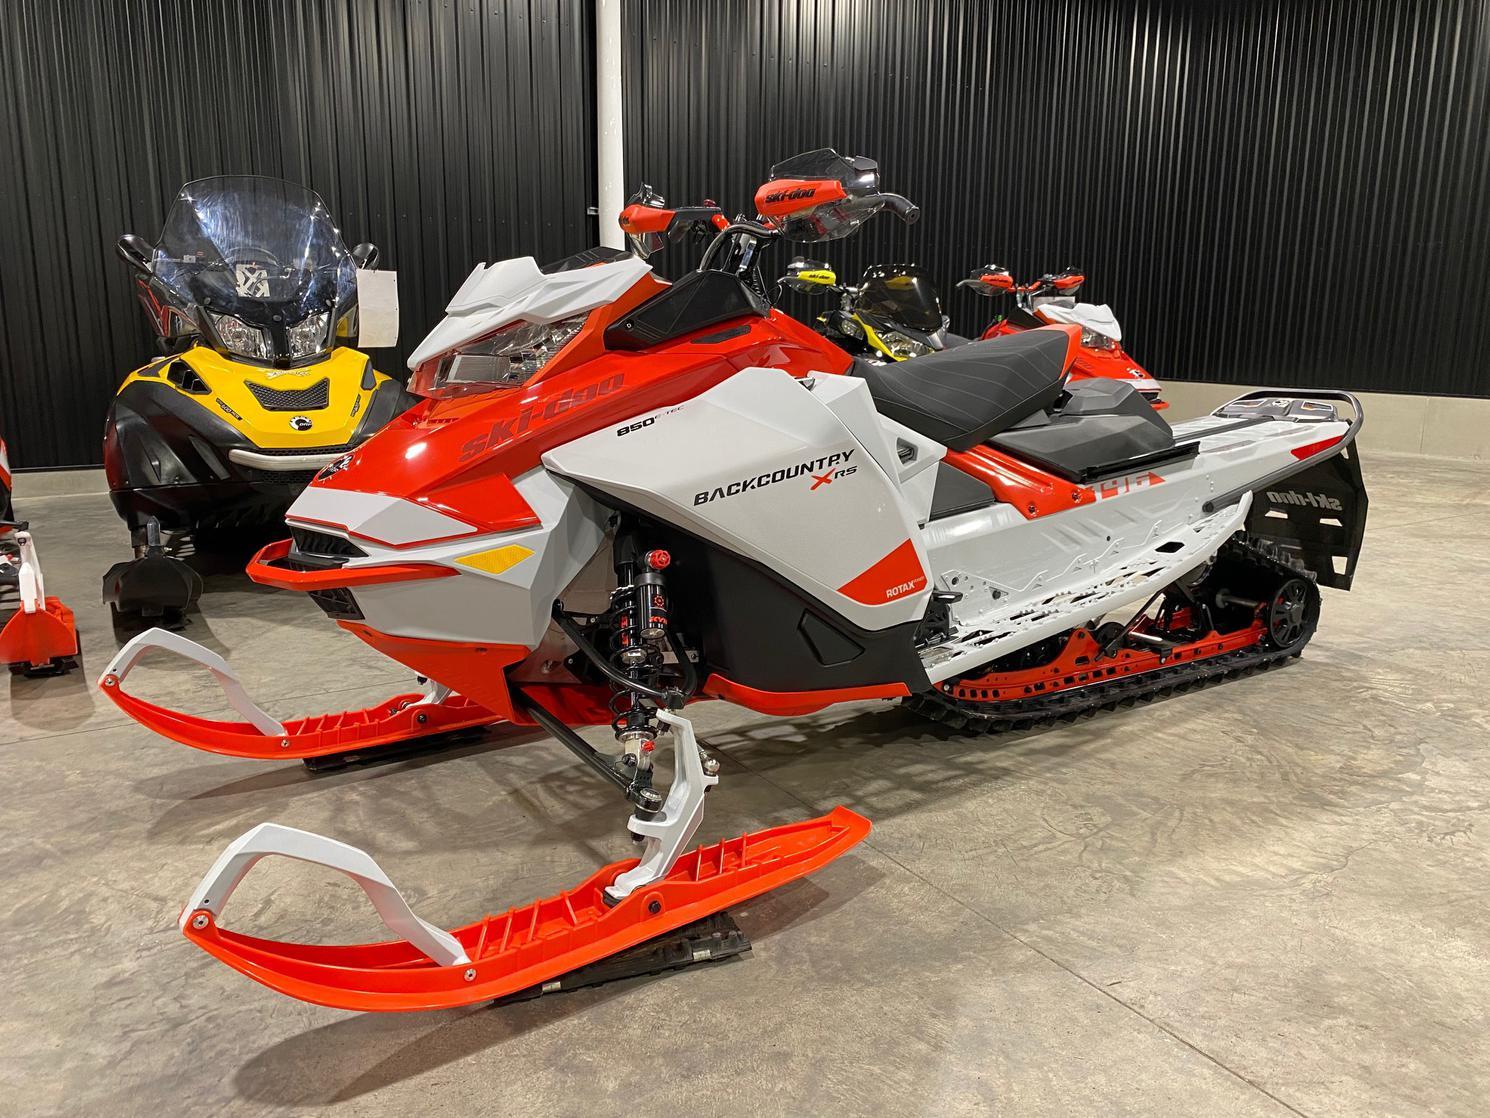 Ski-Doo BACKCOUNTRY XR-S 2021 - 850cc 146X1.6 ICE RIPPER